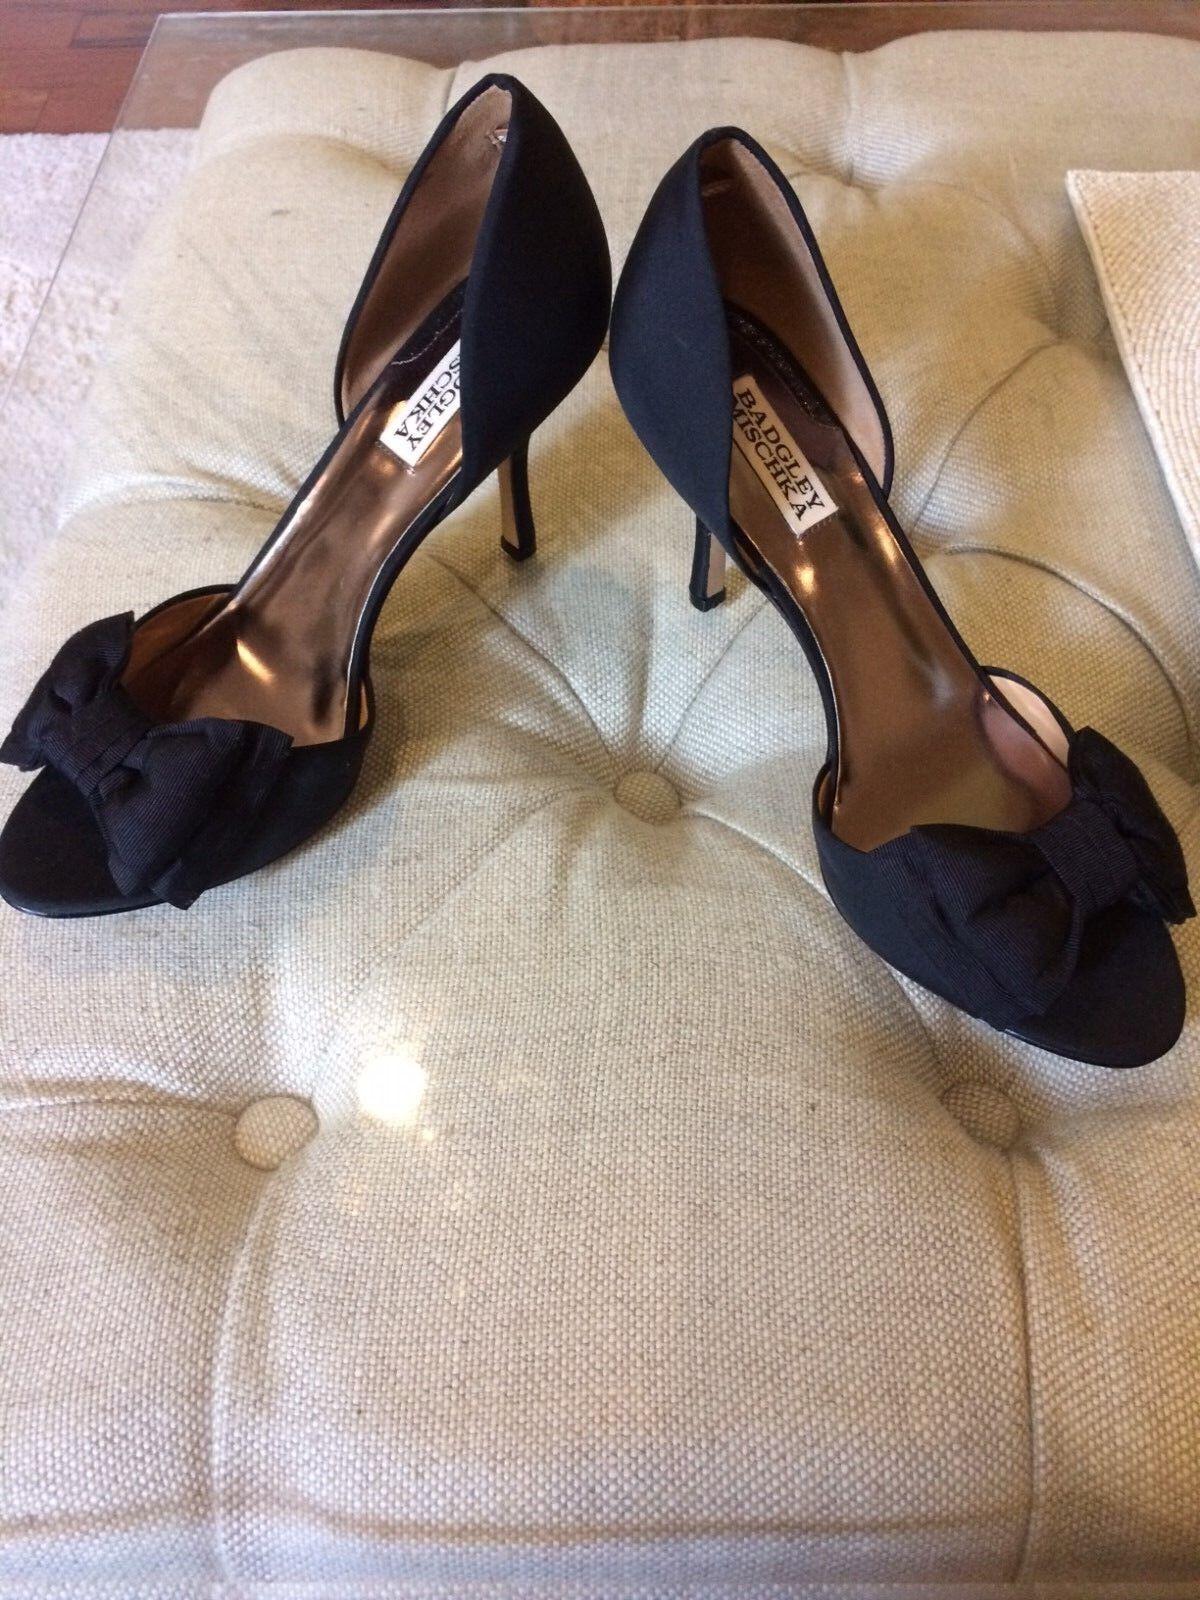 Badgley Mischka high heels satin scarpe with the Bow